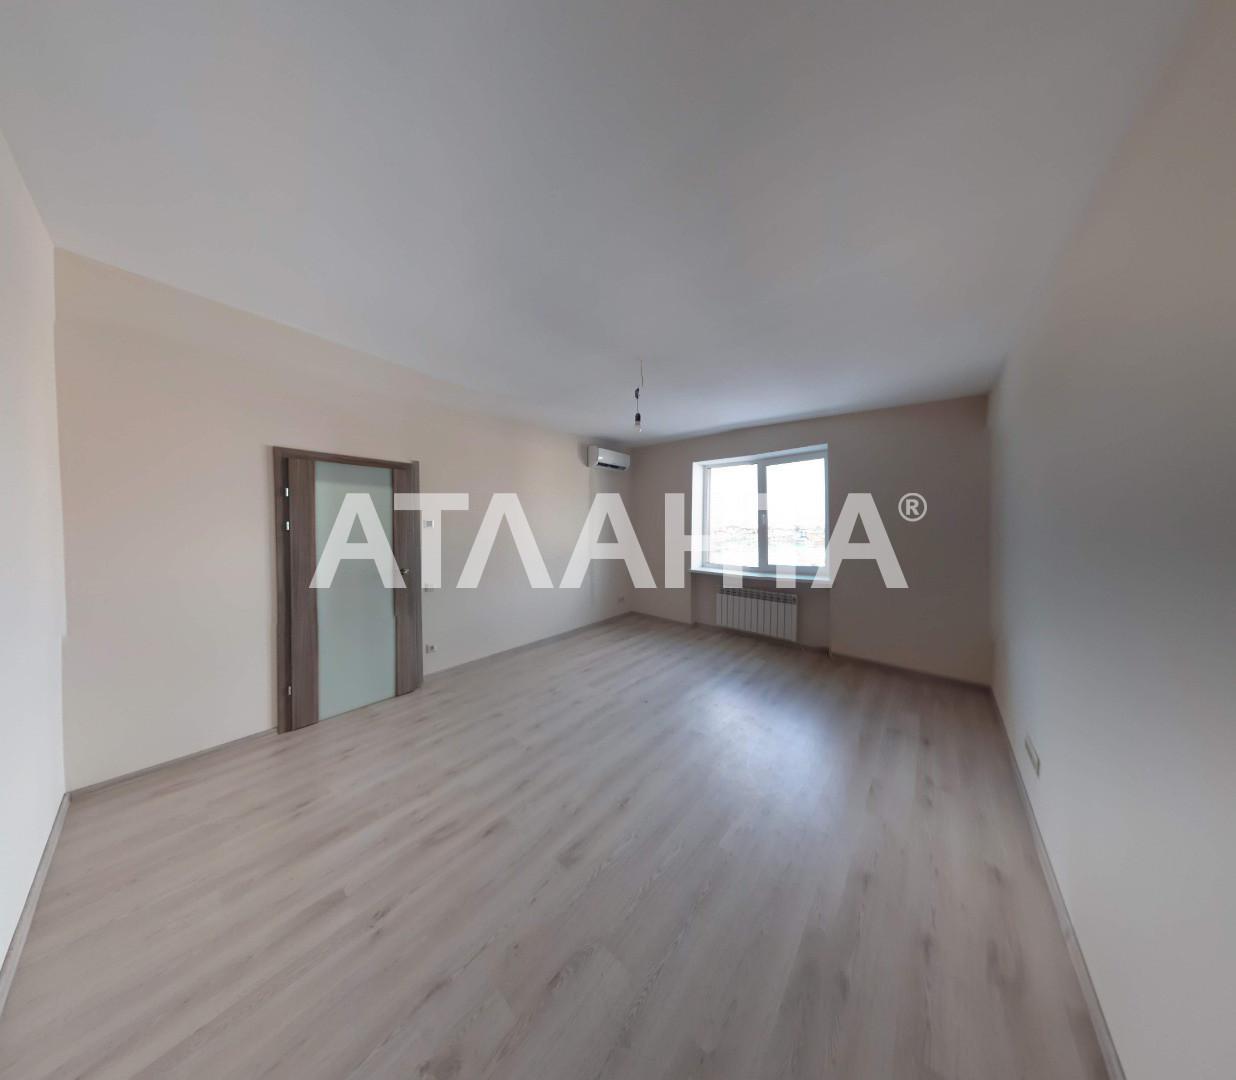 Продается 2-комнатная Квартира на ул. Ул. Академика Вильямса — 60 000 у.е. (фото №2)